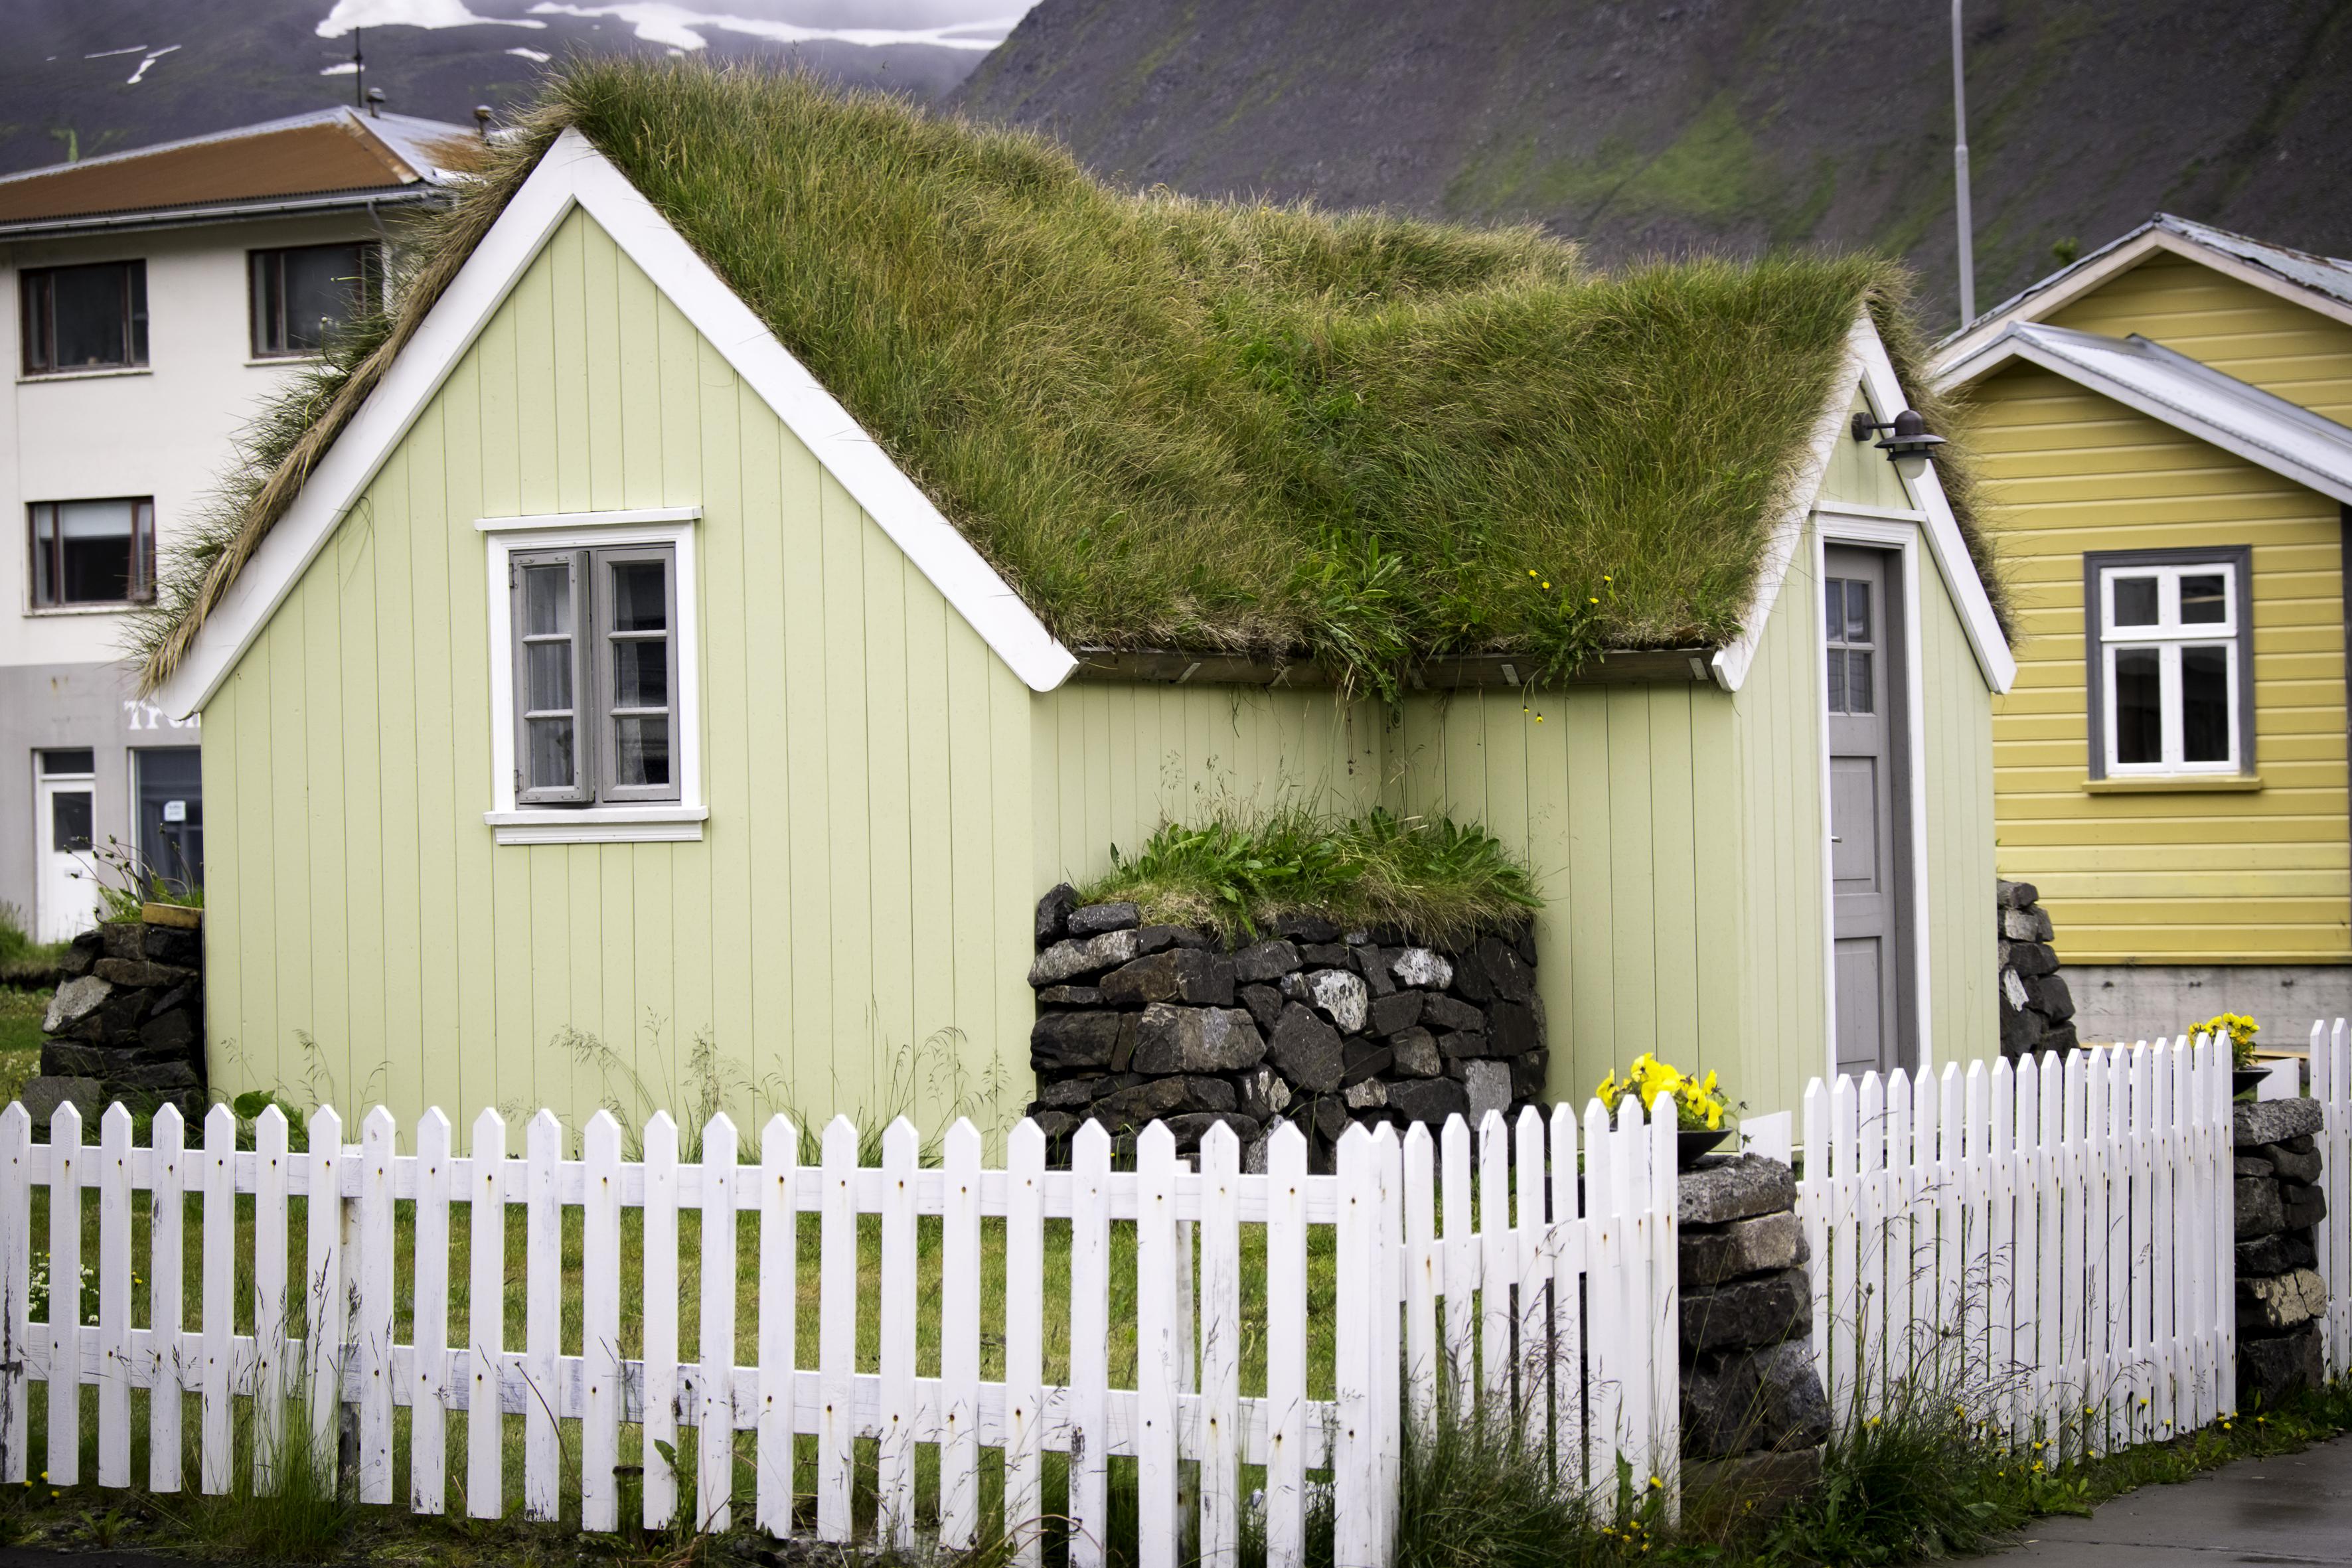 Kostenlose Foto Zaun Haus Dach Zuhause Schuppen Veranda